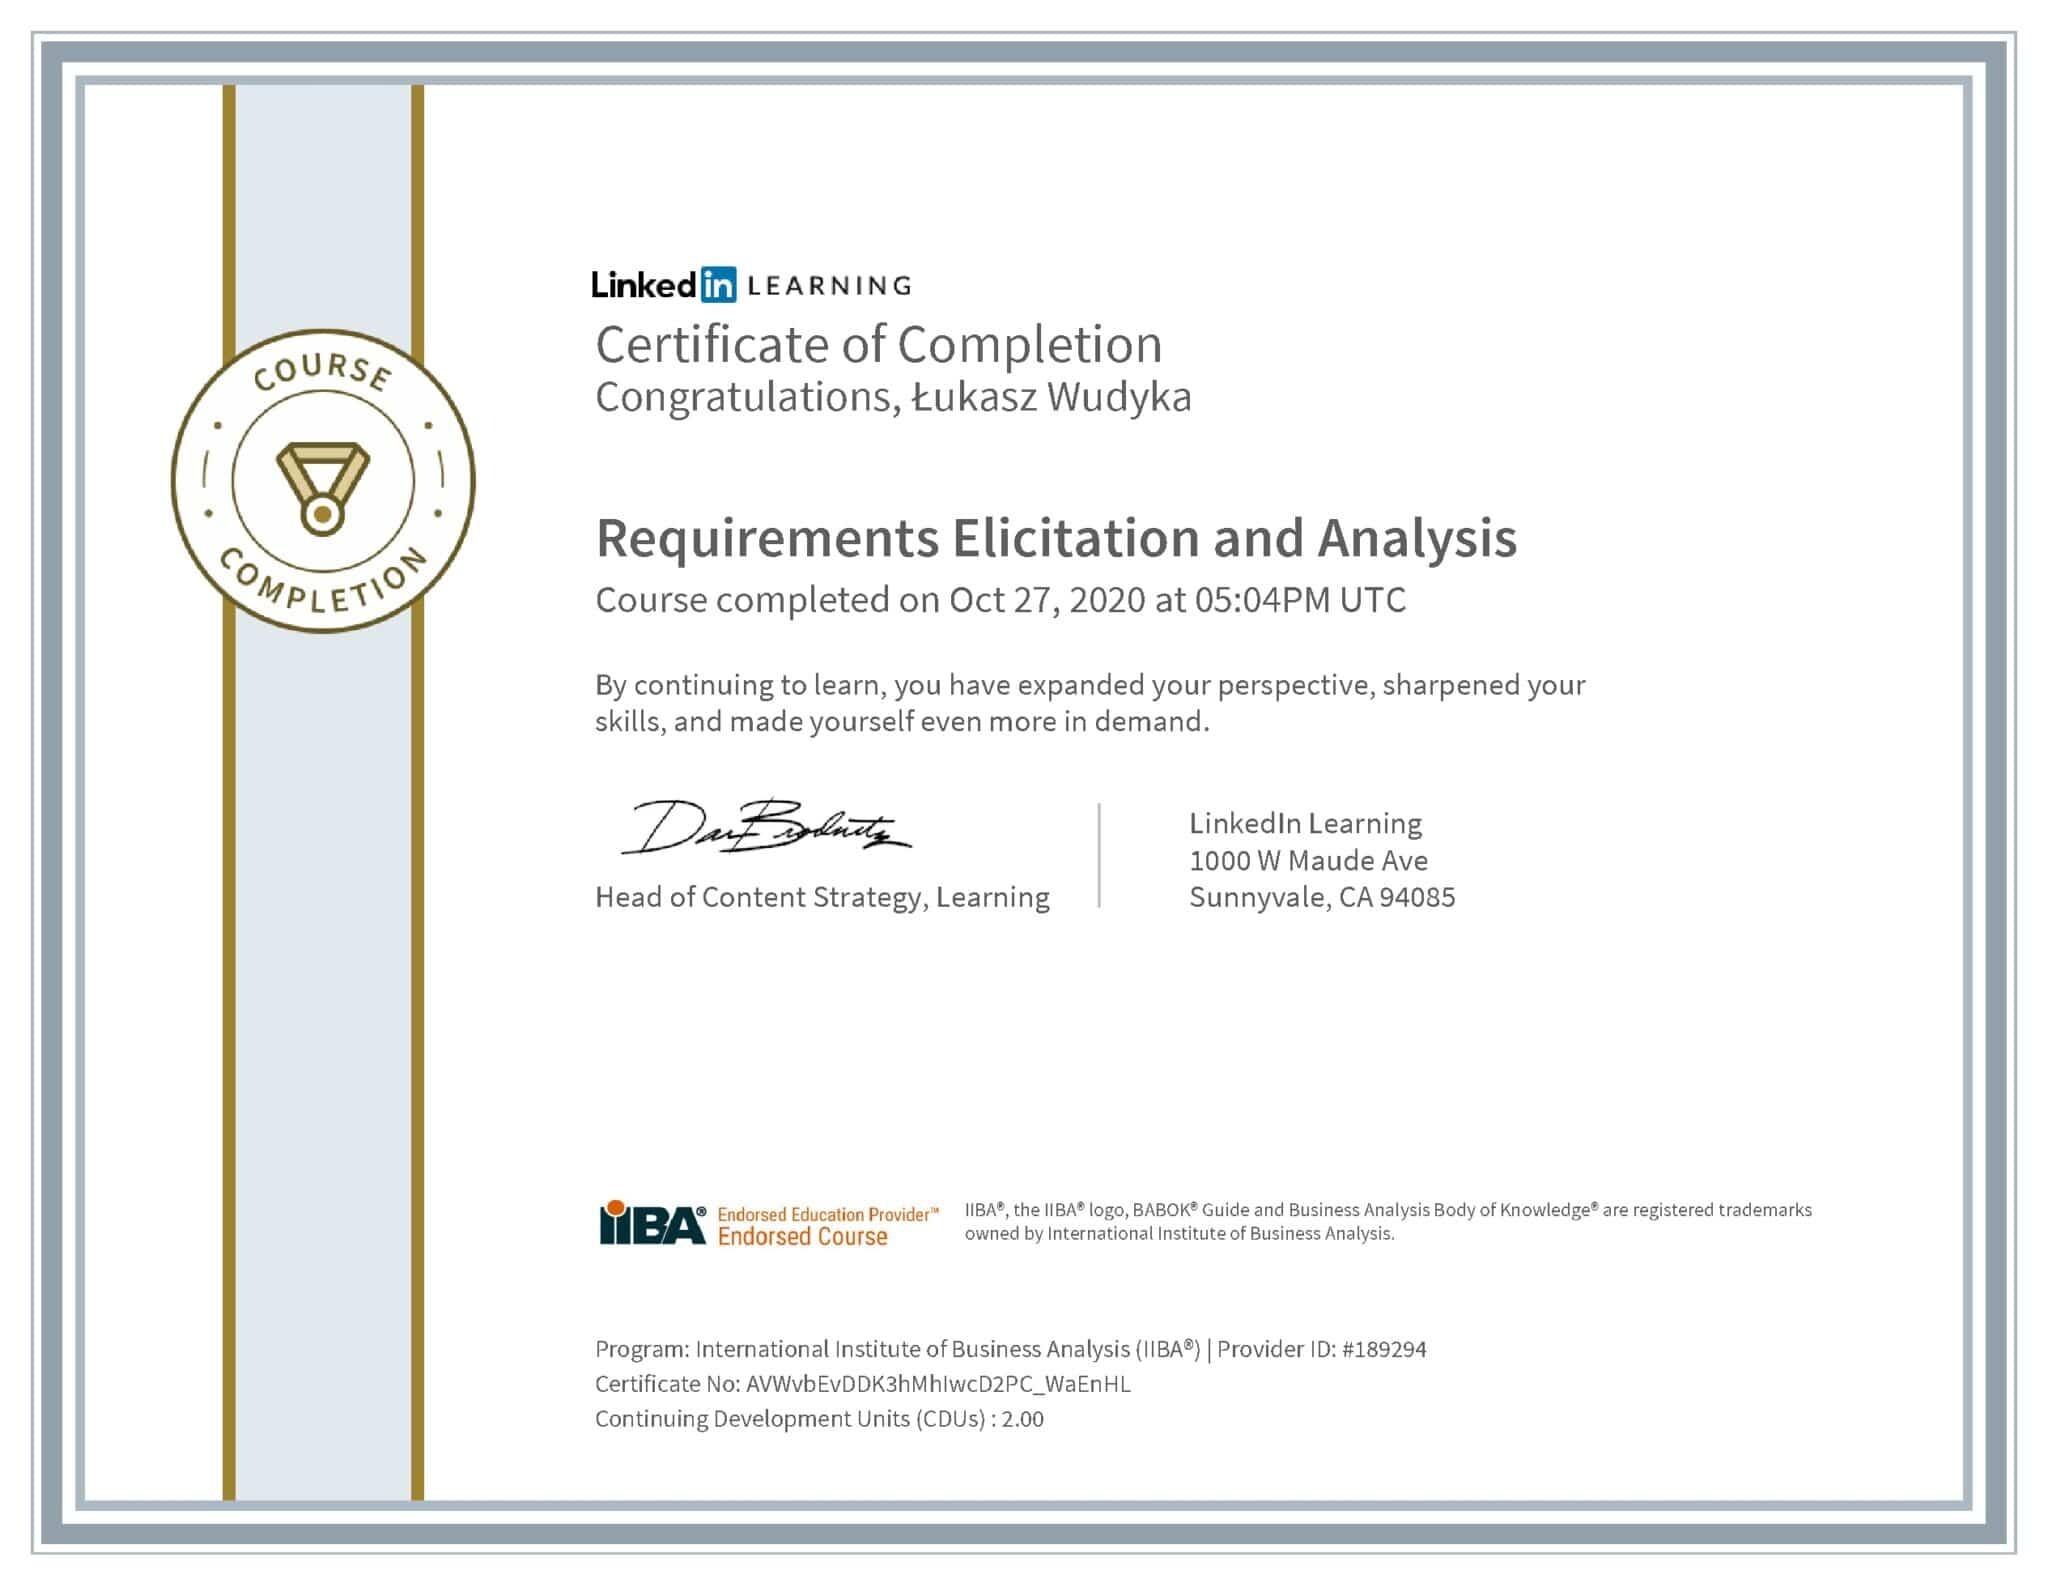 Łukasz Wudyka certyfikat LinkedIn Requirements Elicitation and Analysis IIBA